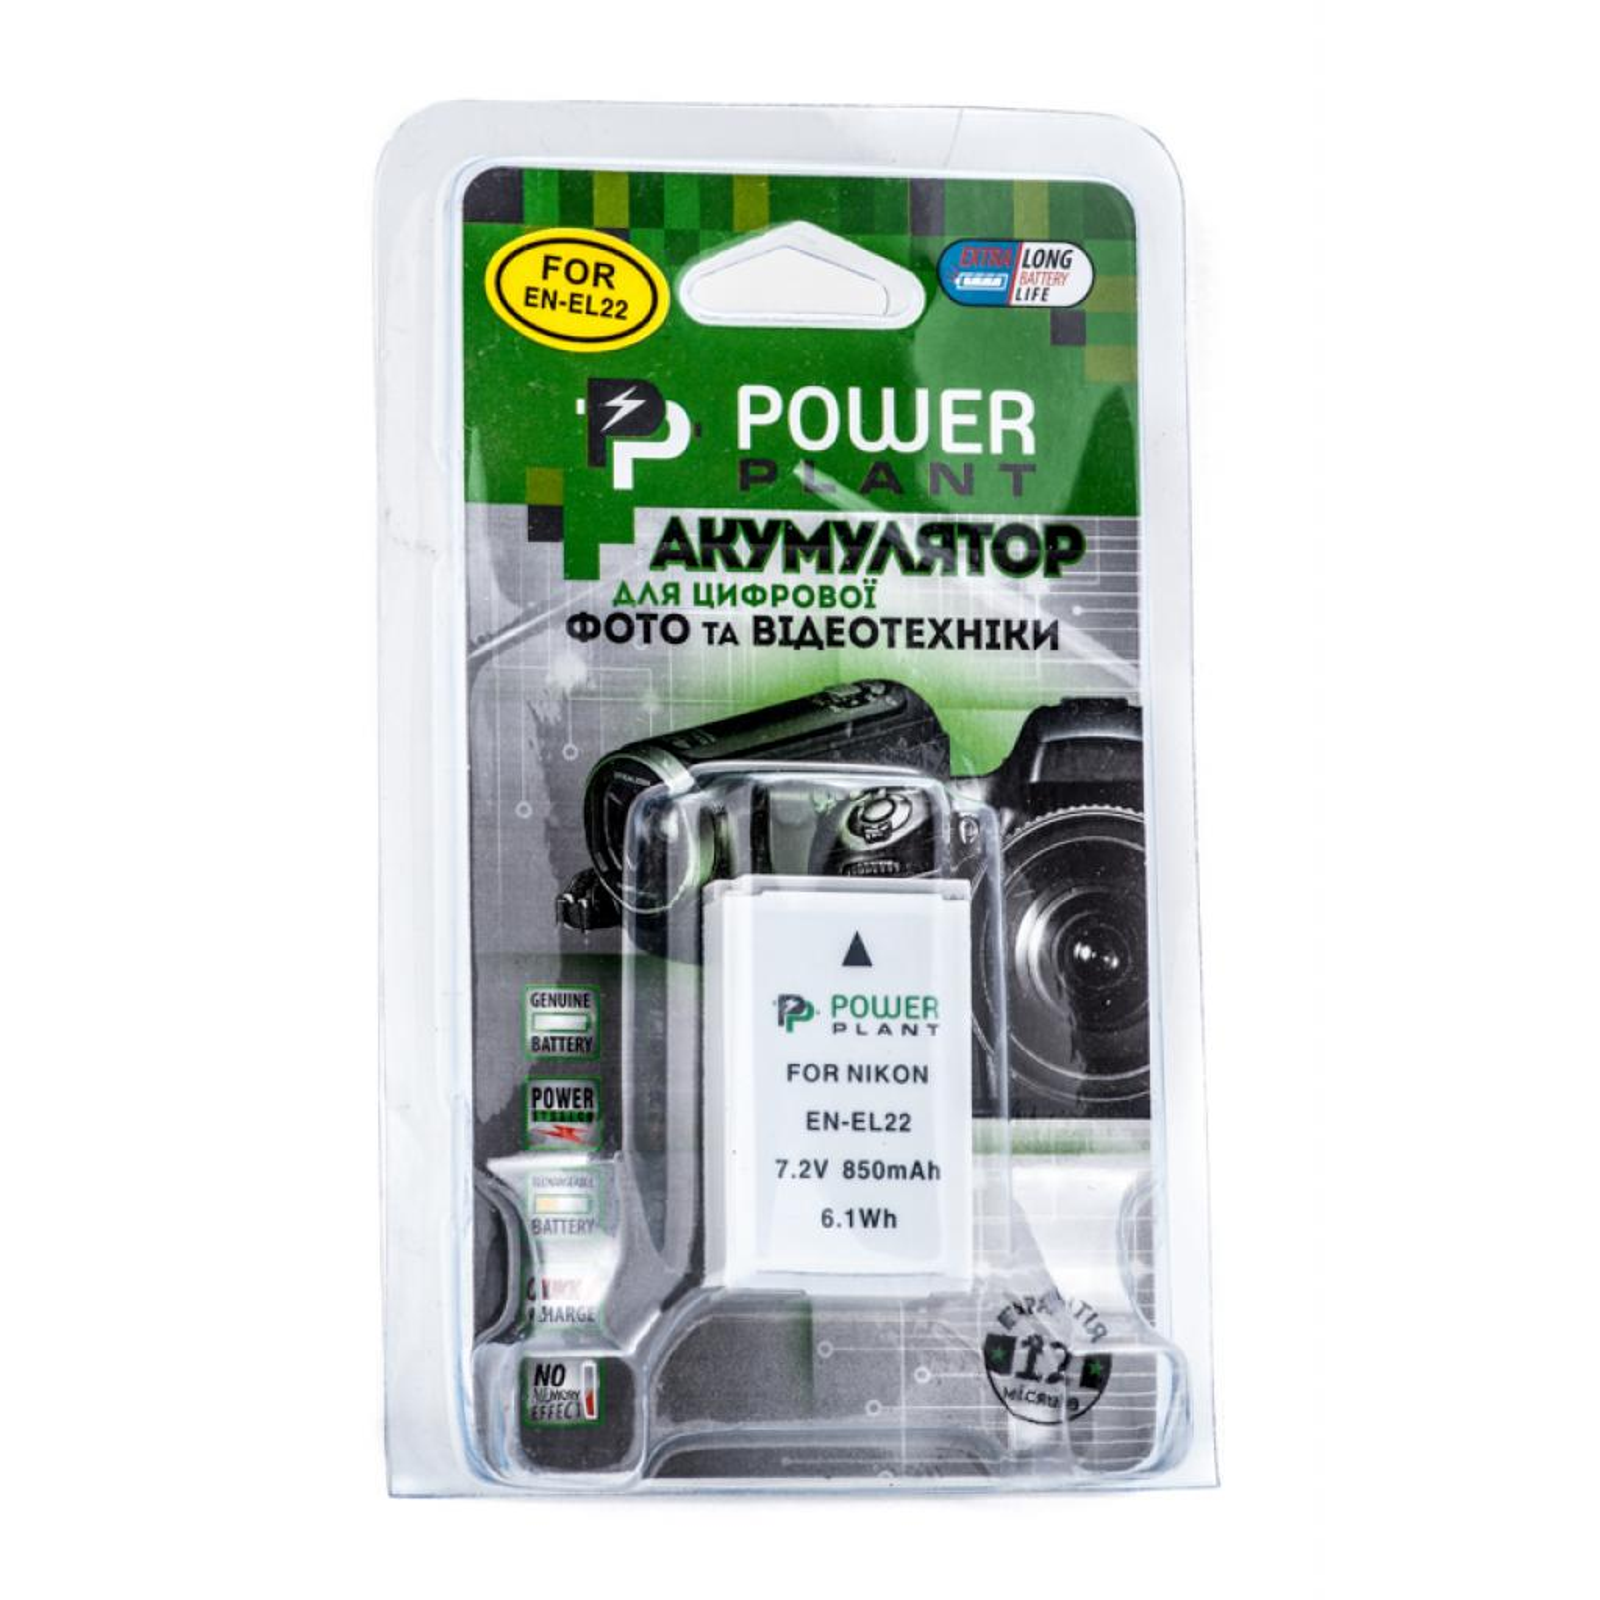 Аккумулятор к фото/видео PowerPlant Nikon EN-EL22 (DV00DV1399) изображение 2